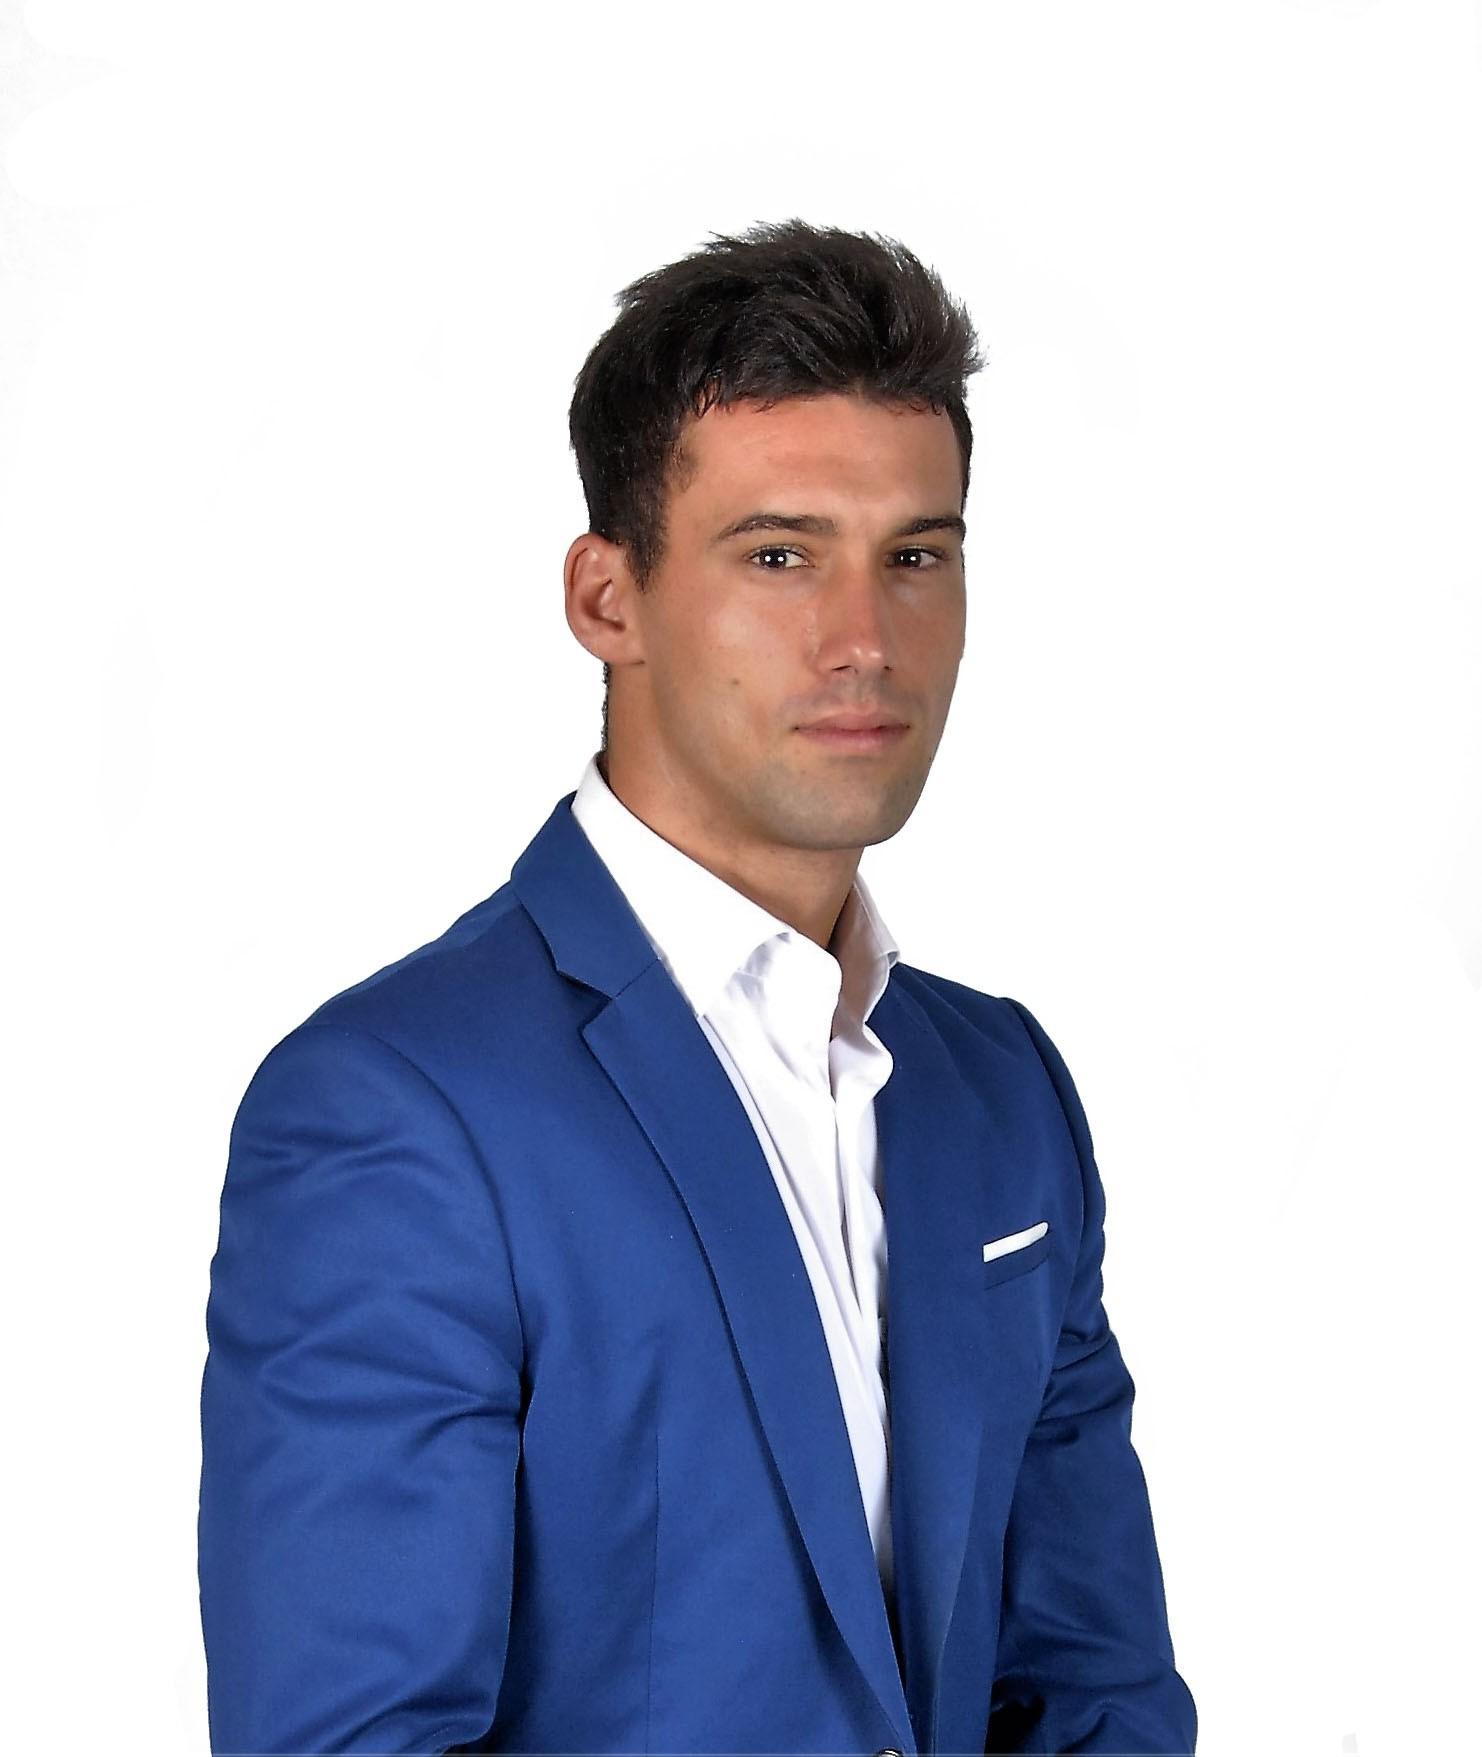 Sergio Montoya Sánchez